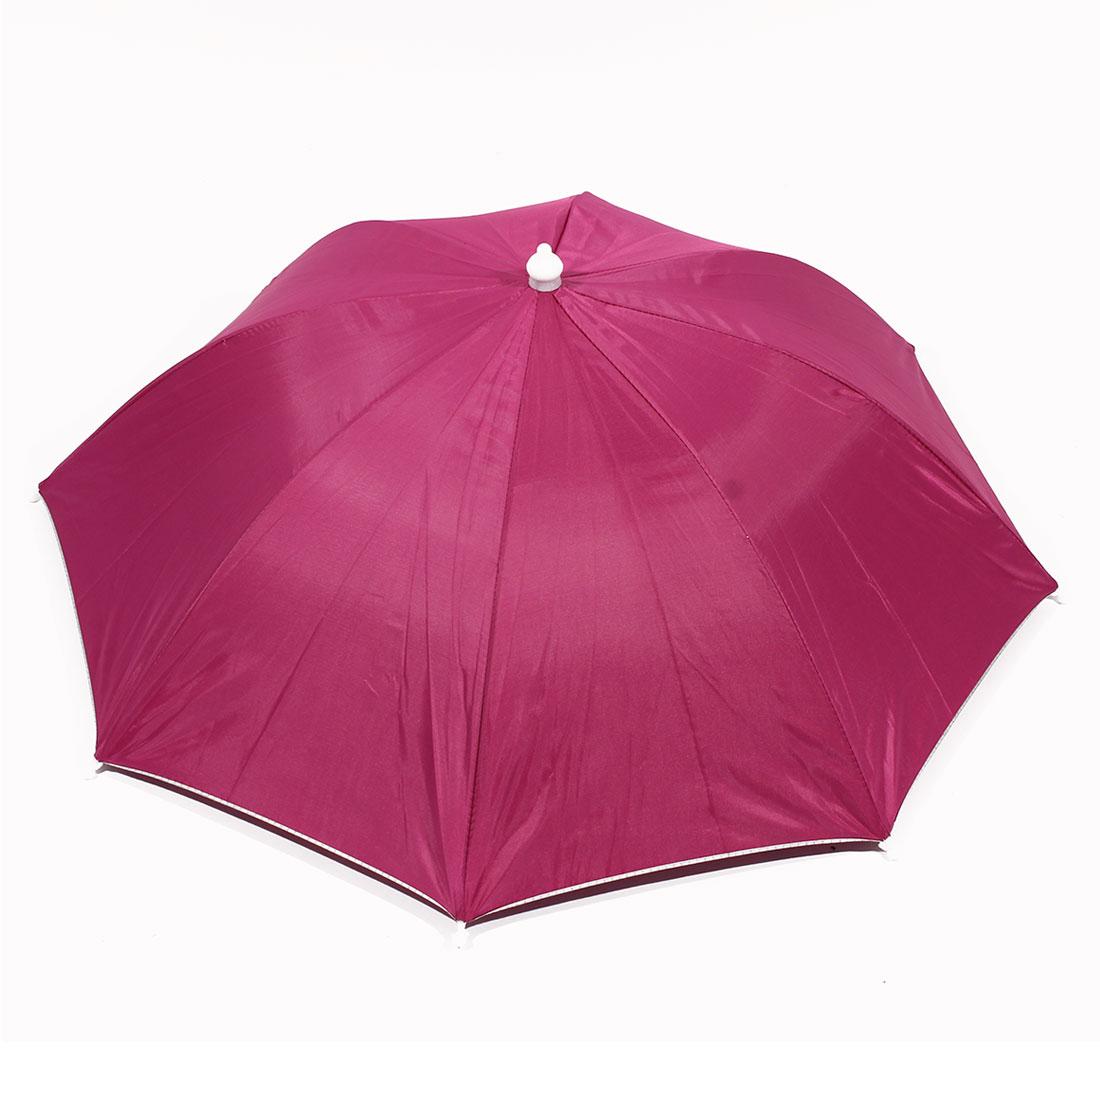 Outdoor Travel Fishing Picnic Headwear Canopy Umbrella Hat Cap Fuchsia